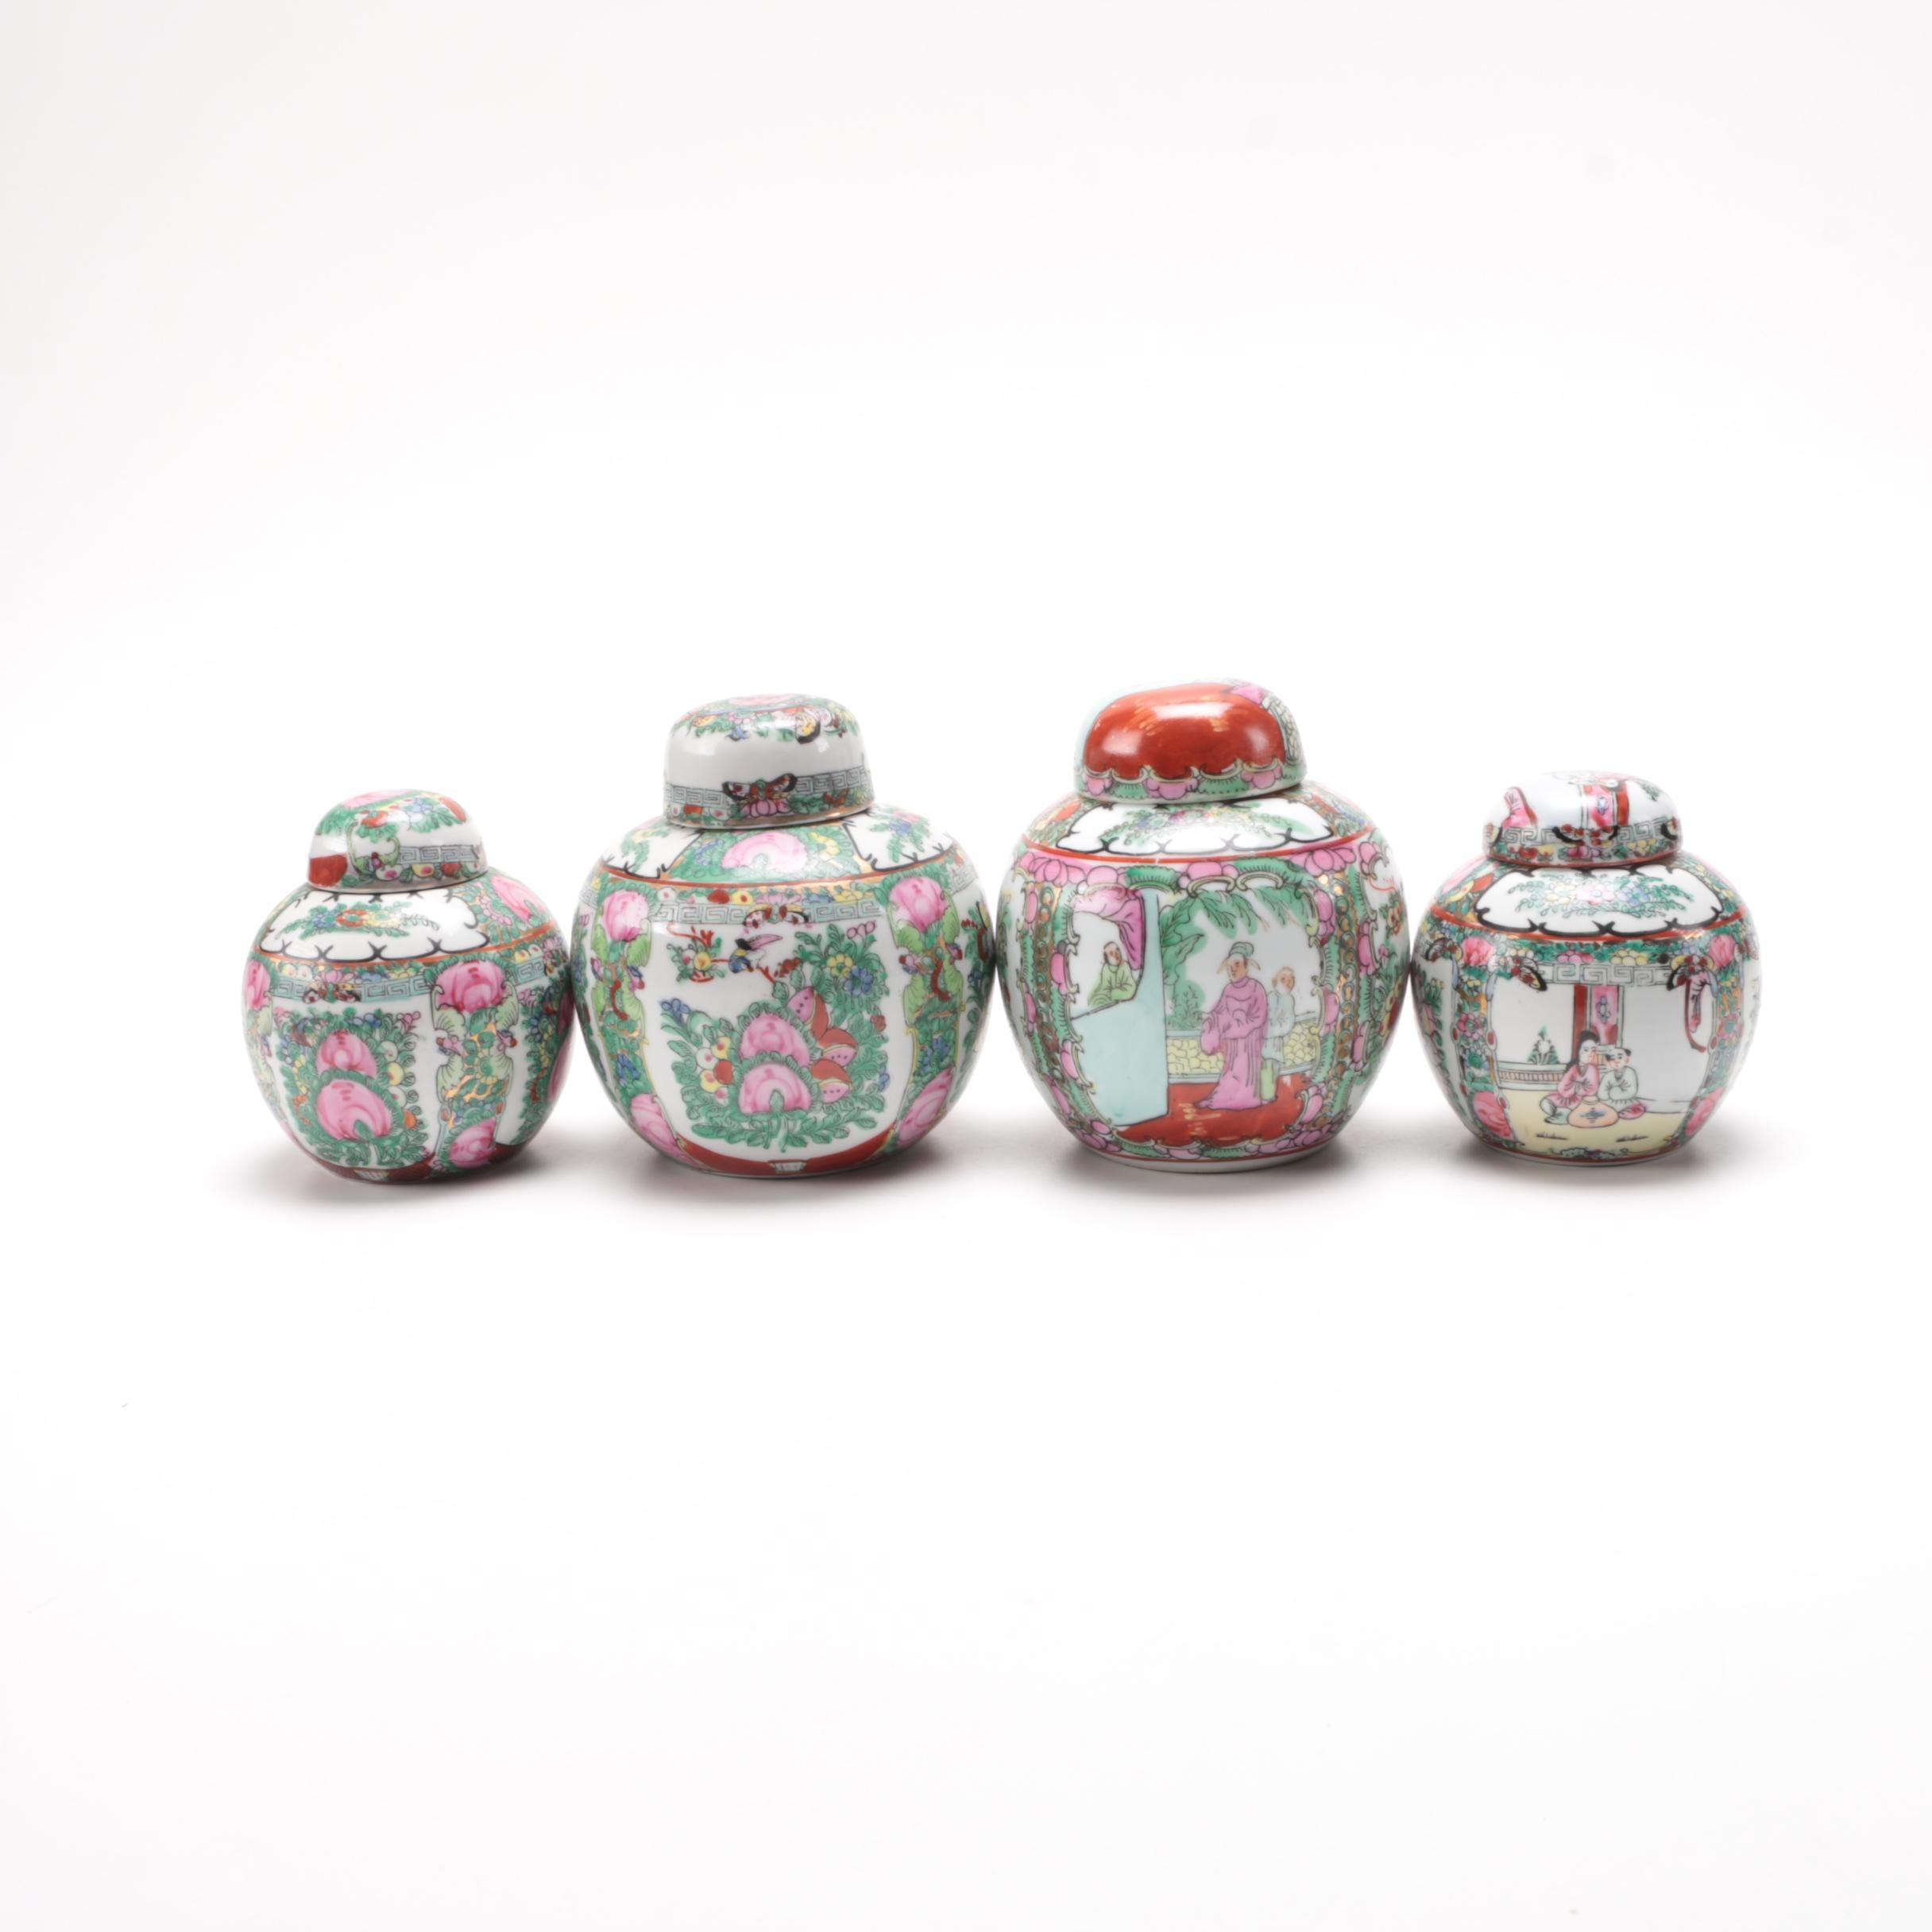 Chinese Rose Medallion Porcelain Ginger Jars